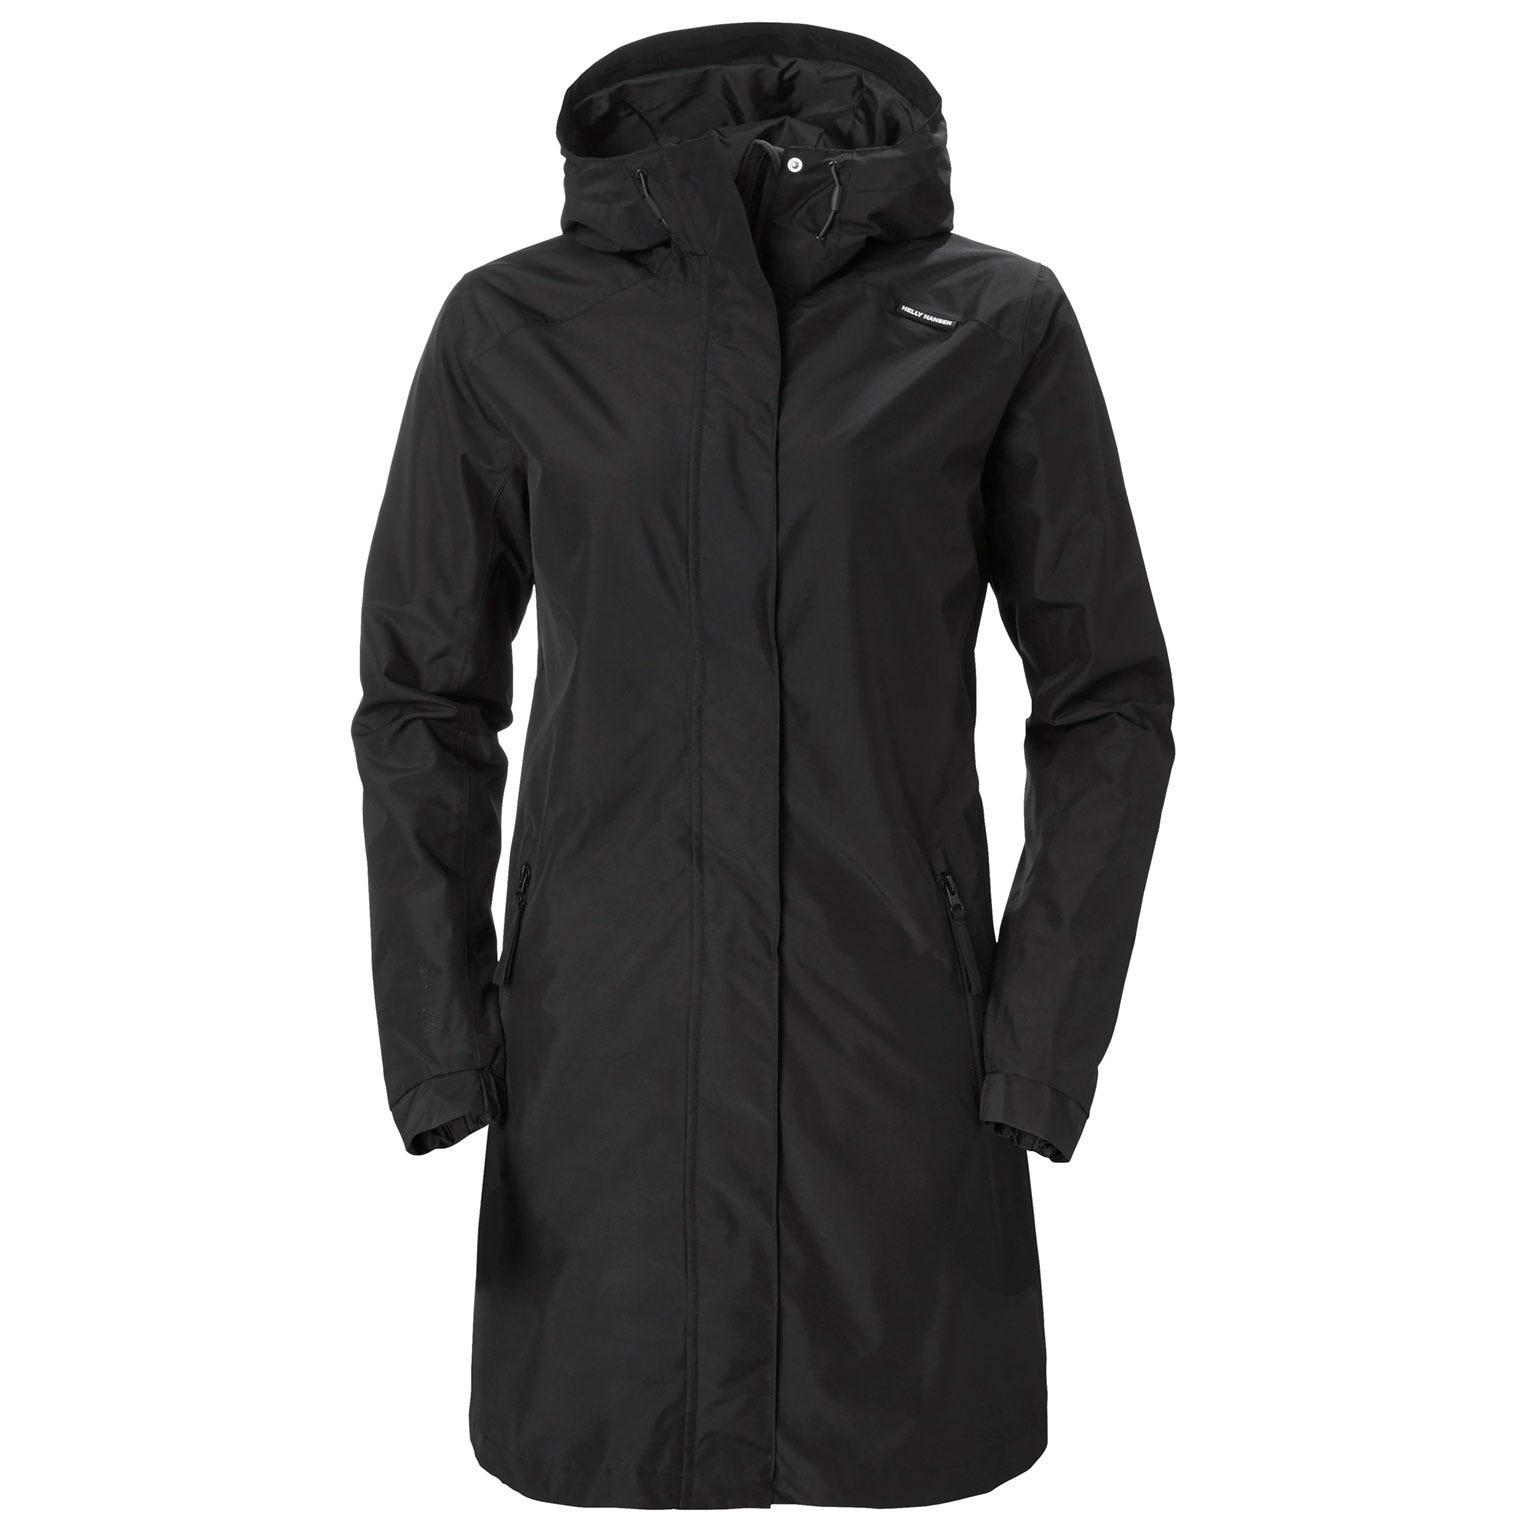 Helly Hansen Women Valkyrie Soft Fleece Rain Jacket Black XS